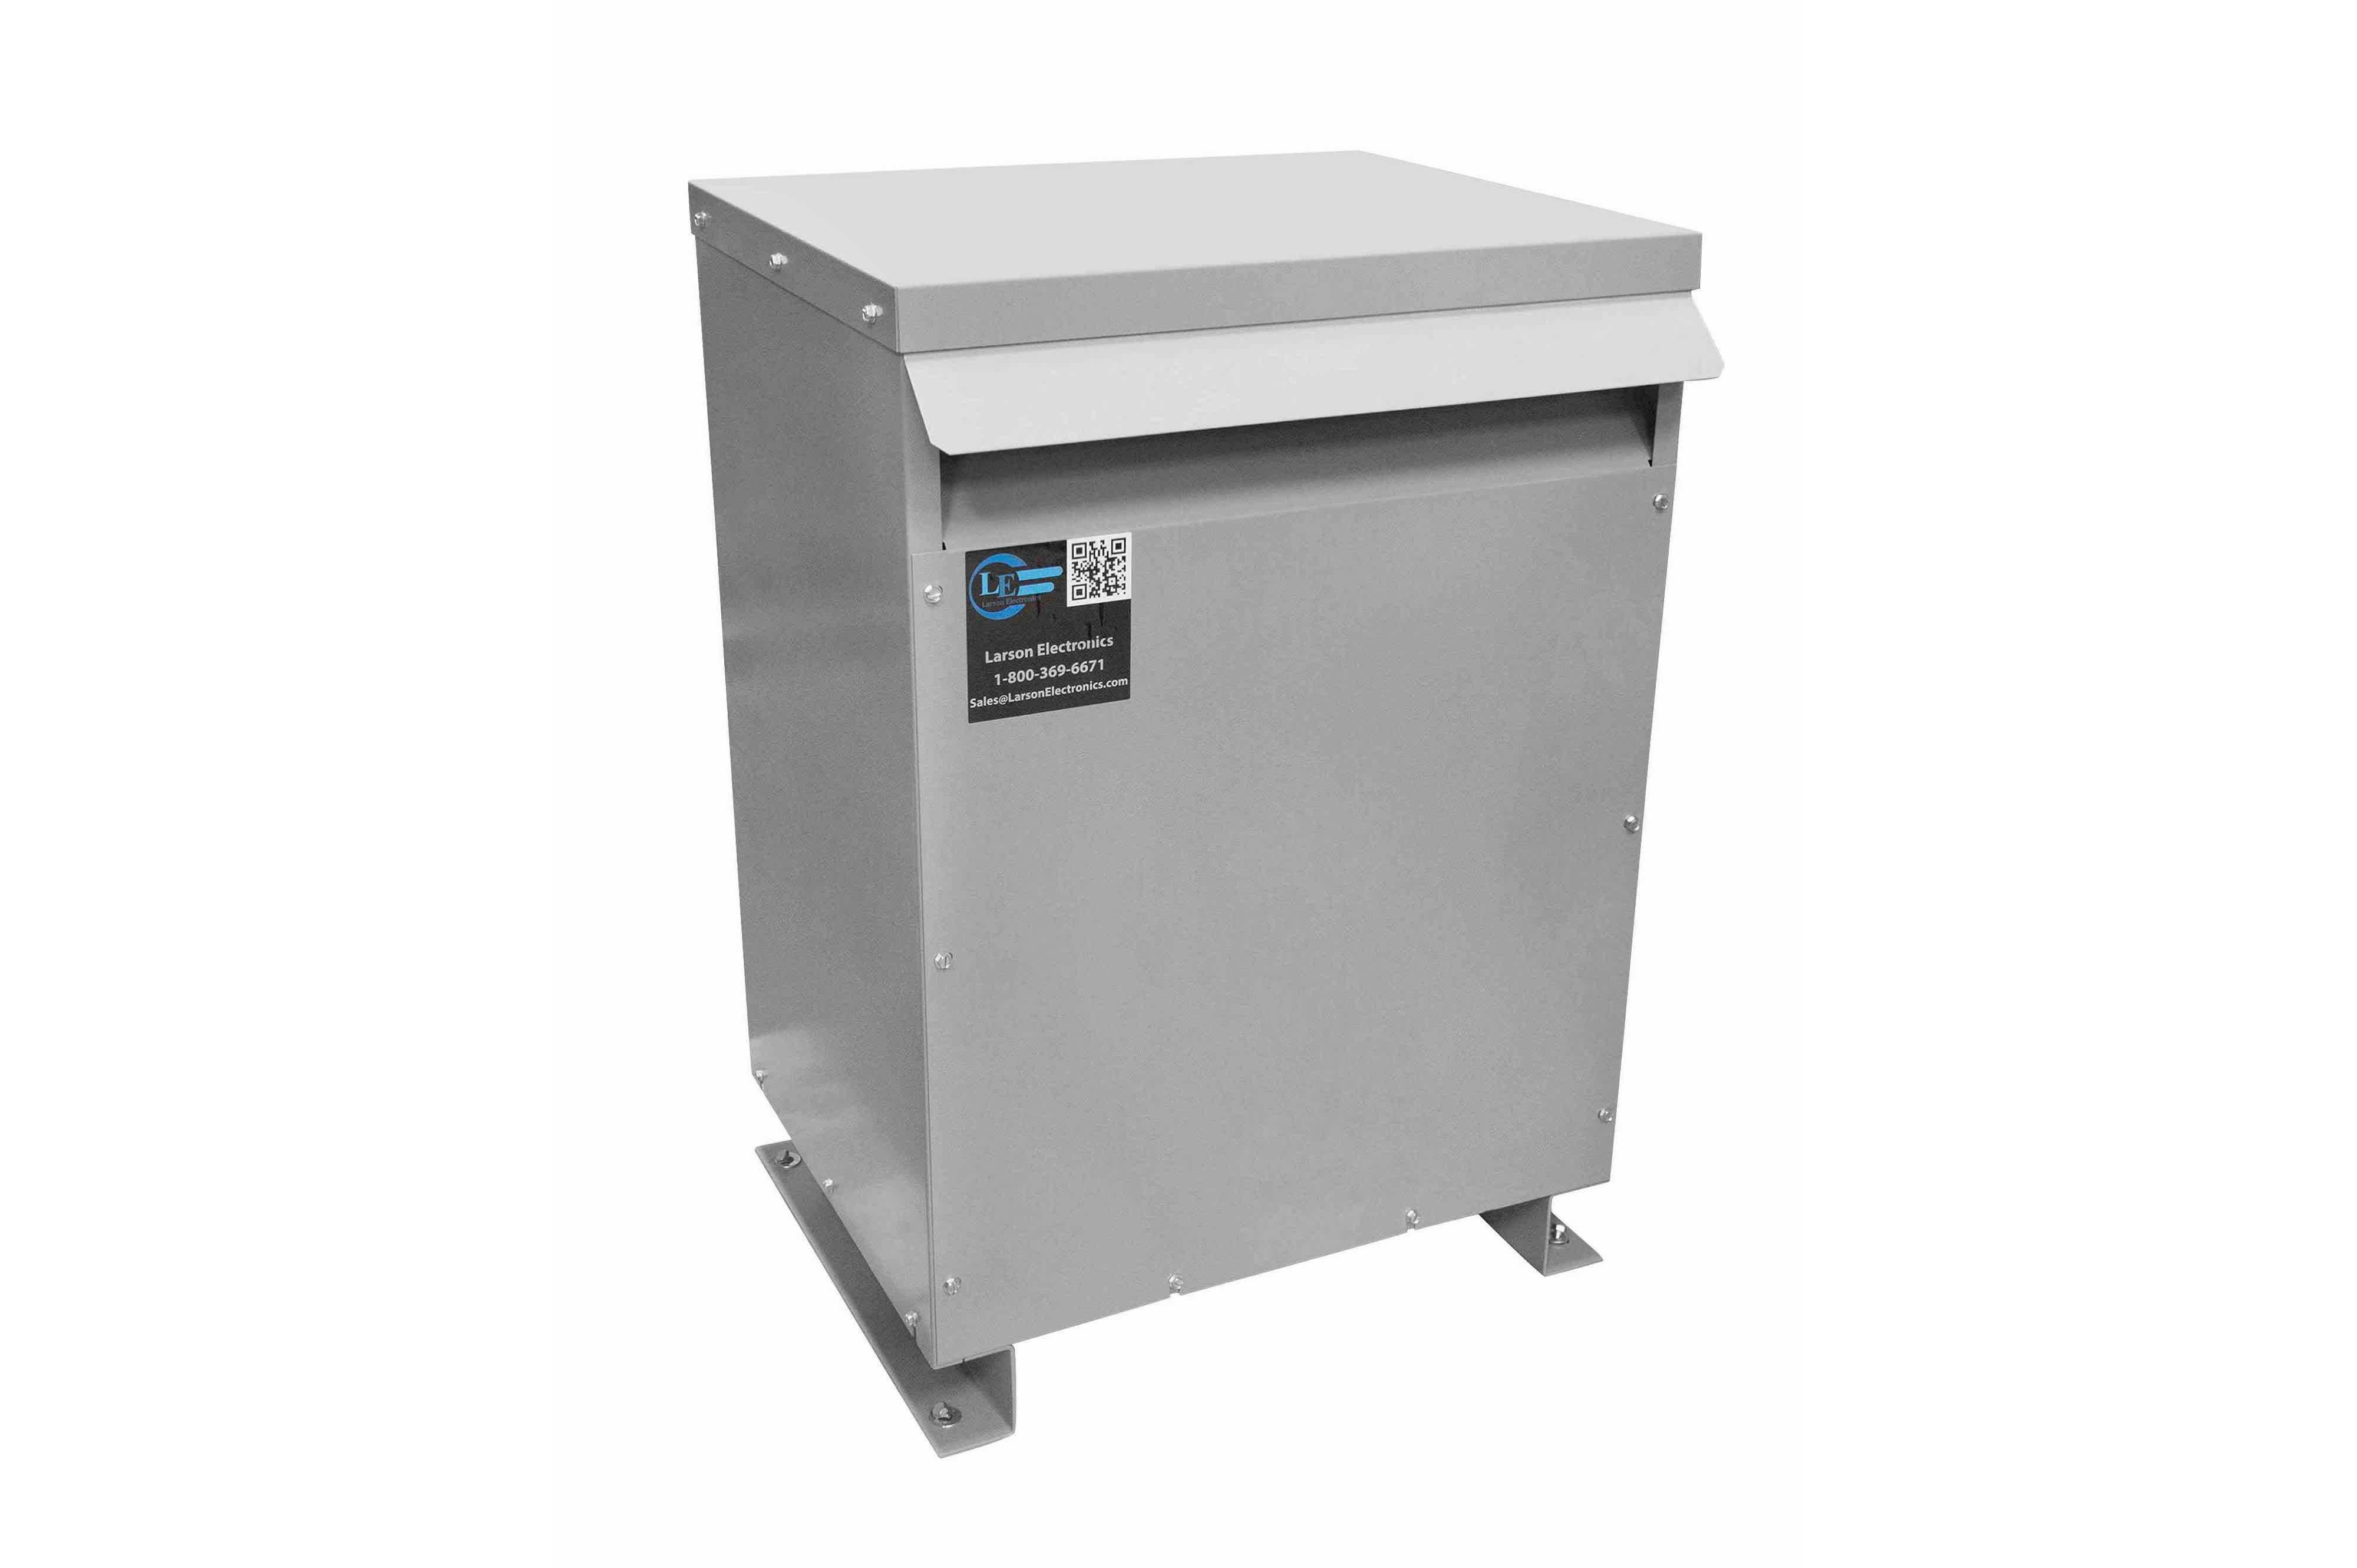 750 kVA 3PH DOE Transformer, 240V Delta Primary, 480Y/277 Wye-N Secondary, N3R, Ventilated, 60 Hz